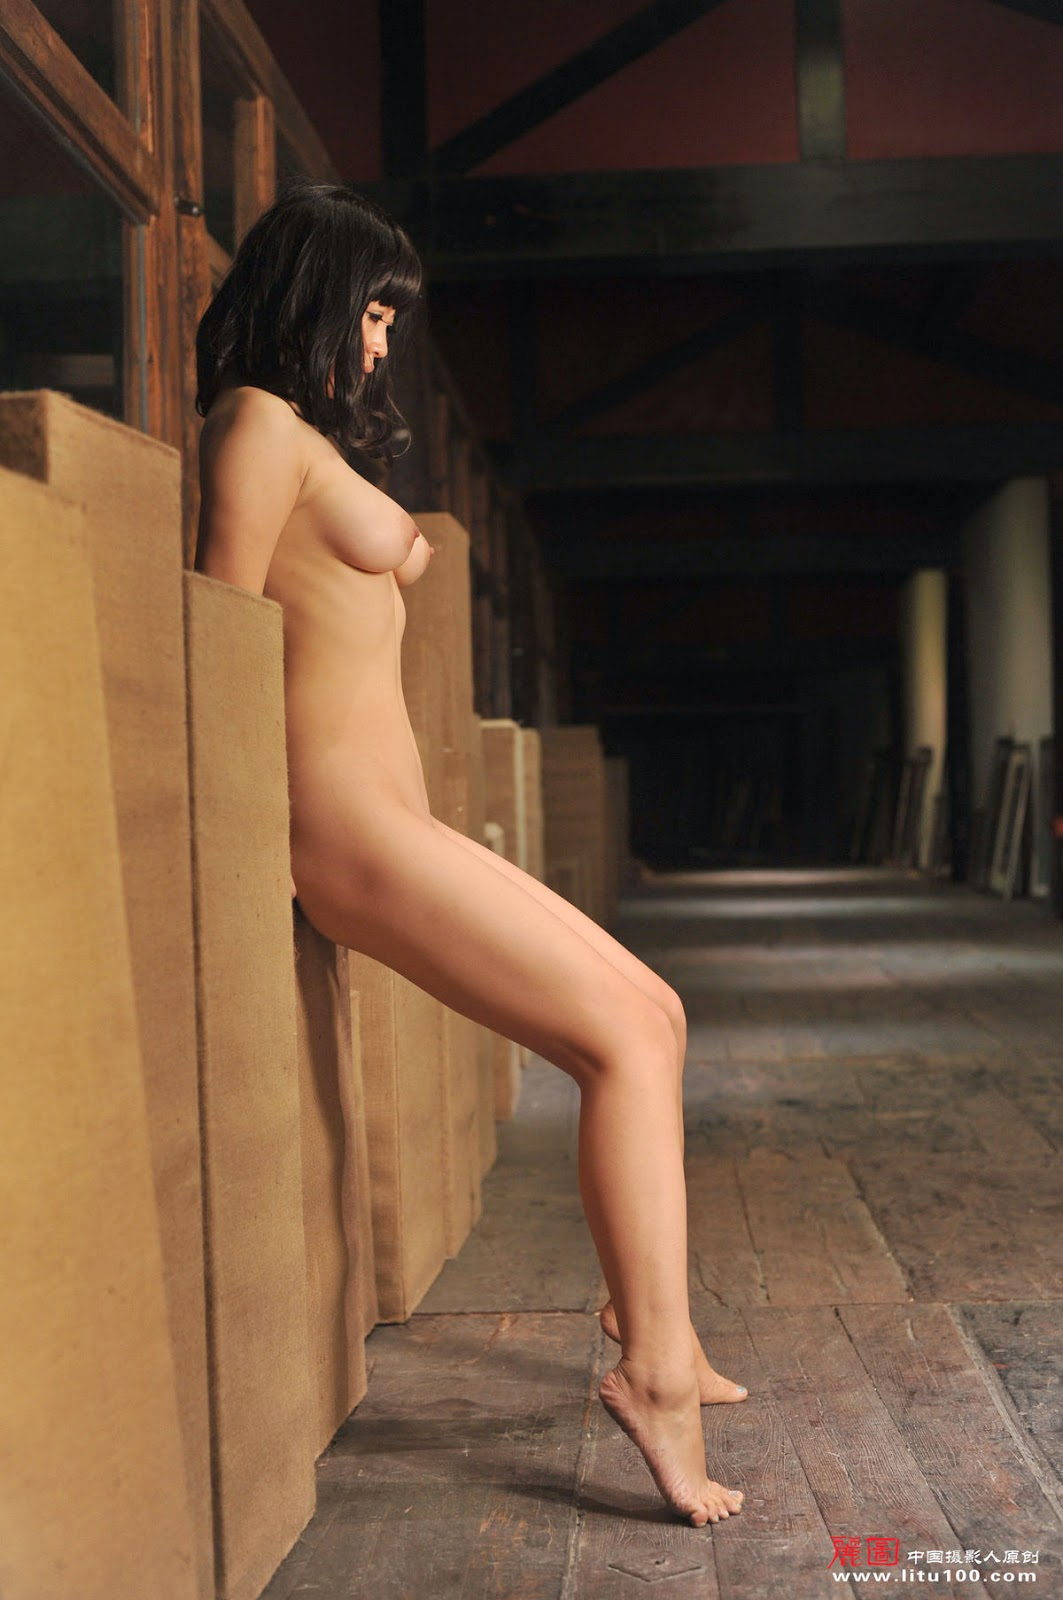 DSC 7301 - Chinese Nude Model Su Quan [Litu100]   18+ gallery photos